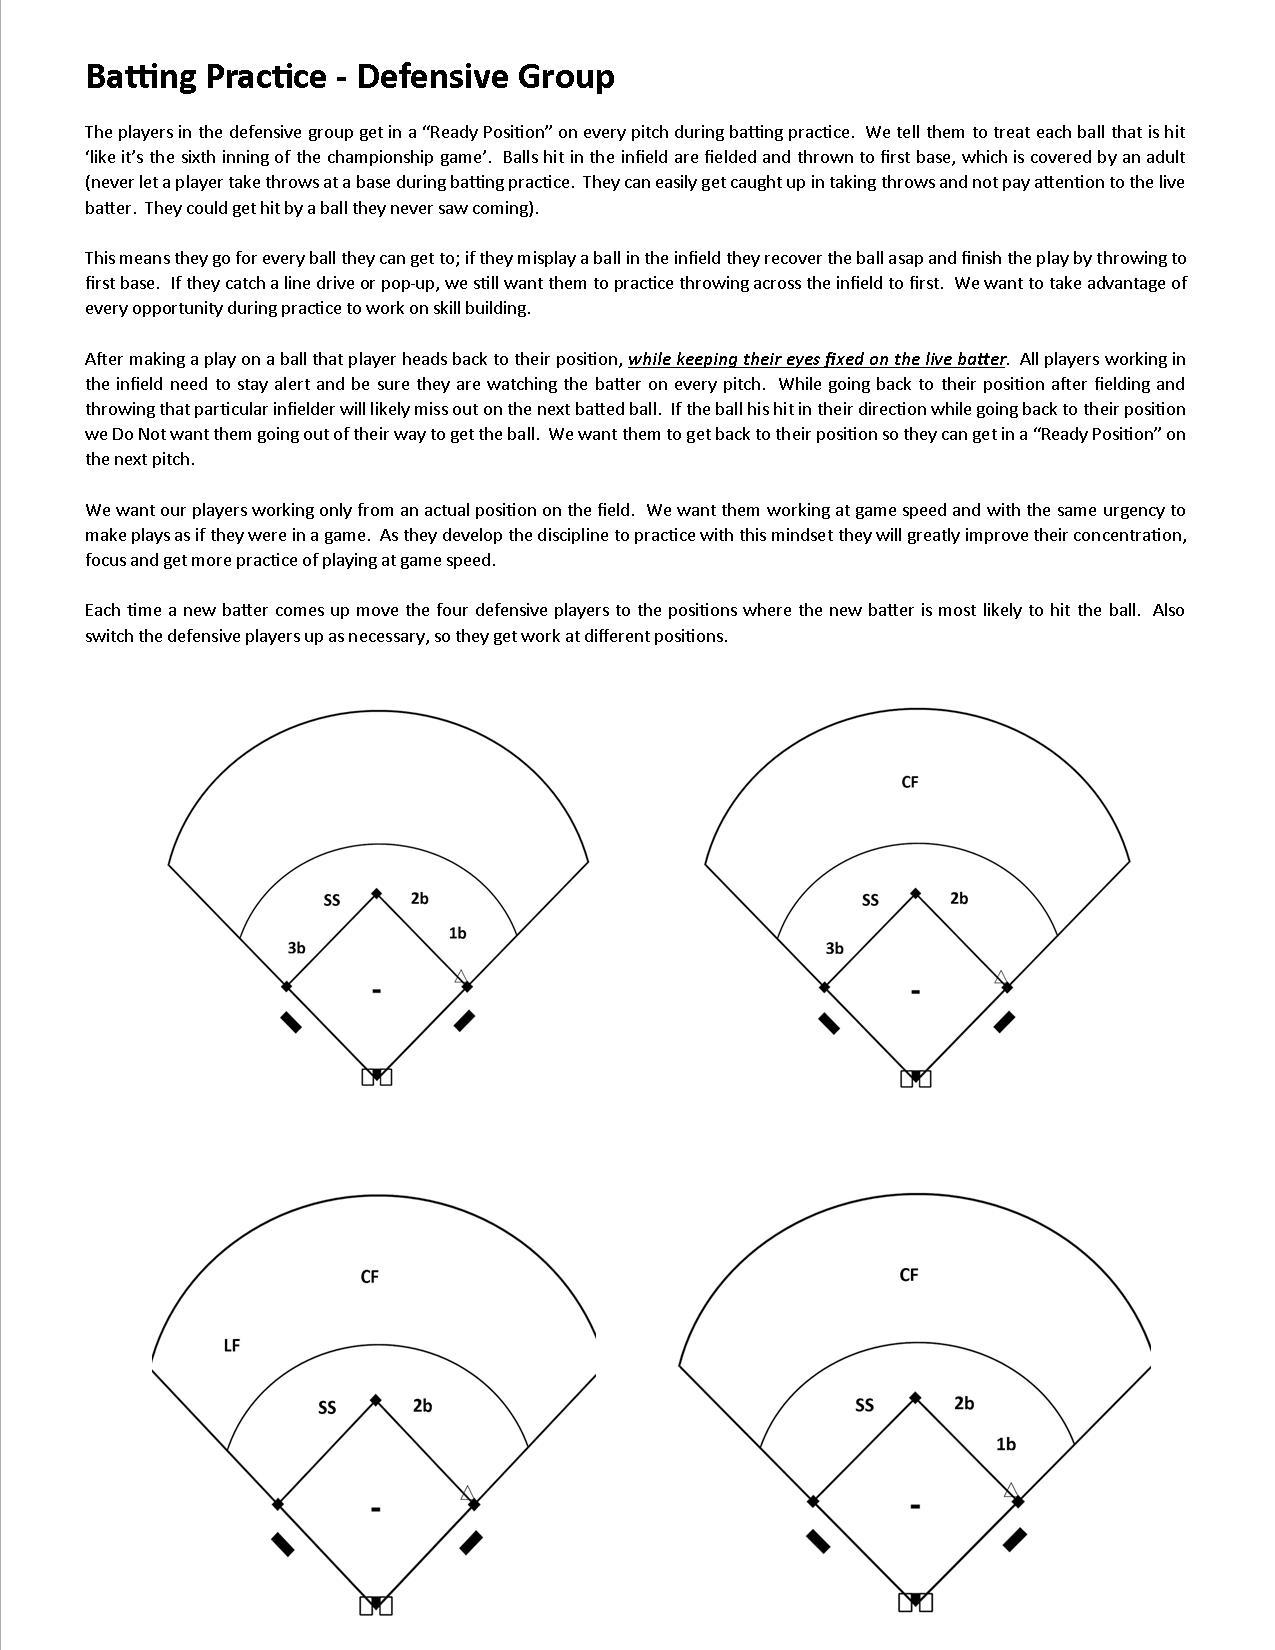 Batting Practice - Defense Group.jpg